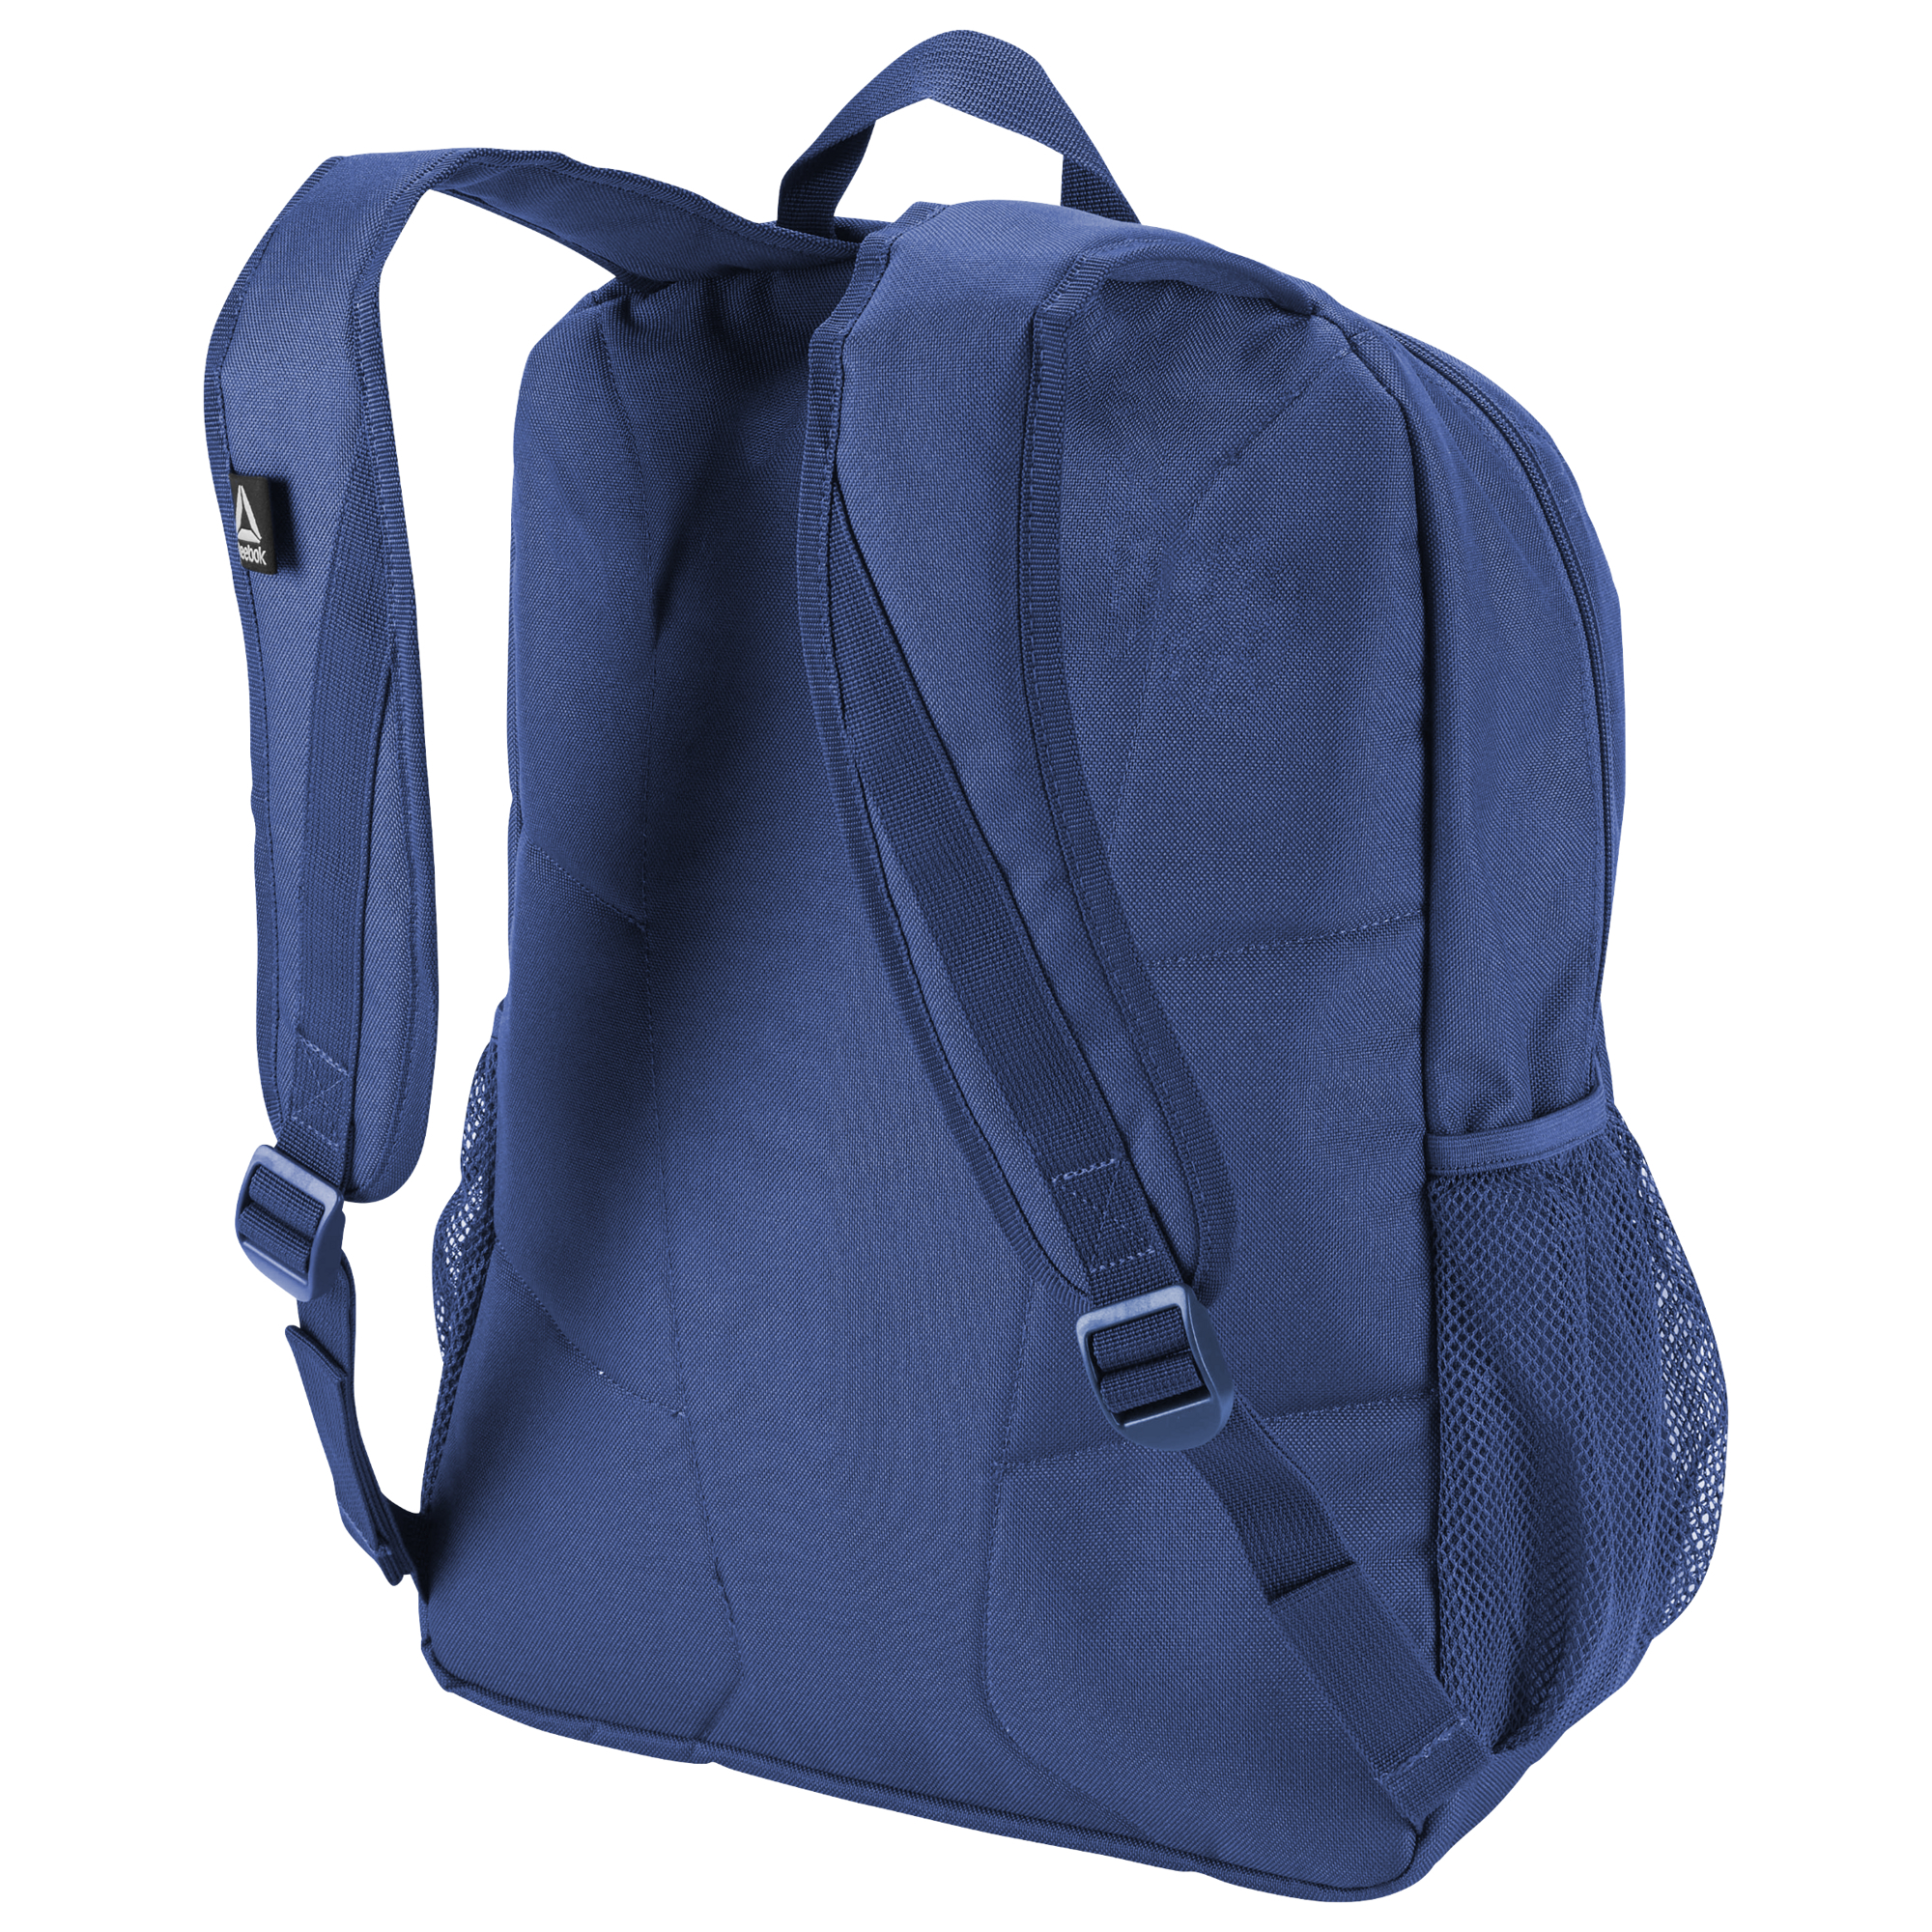 e6336e92aaa69 plecak Reebok Grab And Go CV3384 || timsport.pl - darmowa dostawa ...